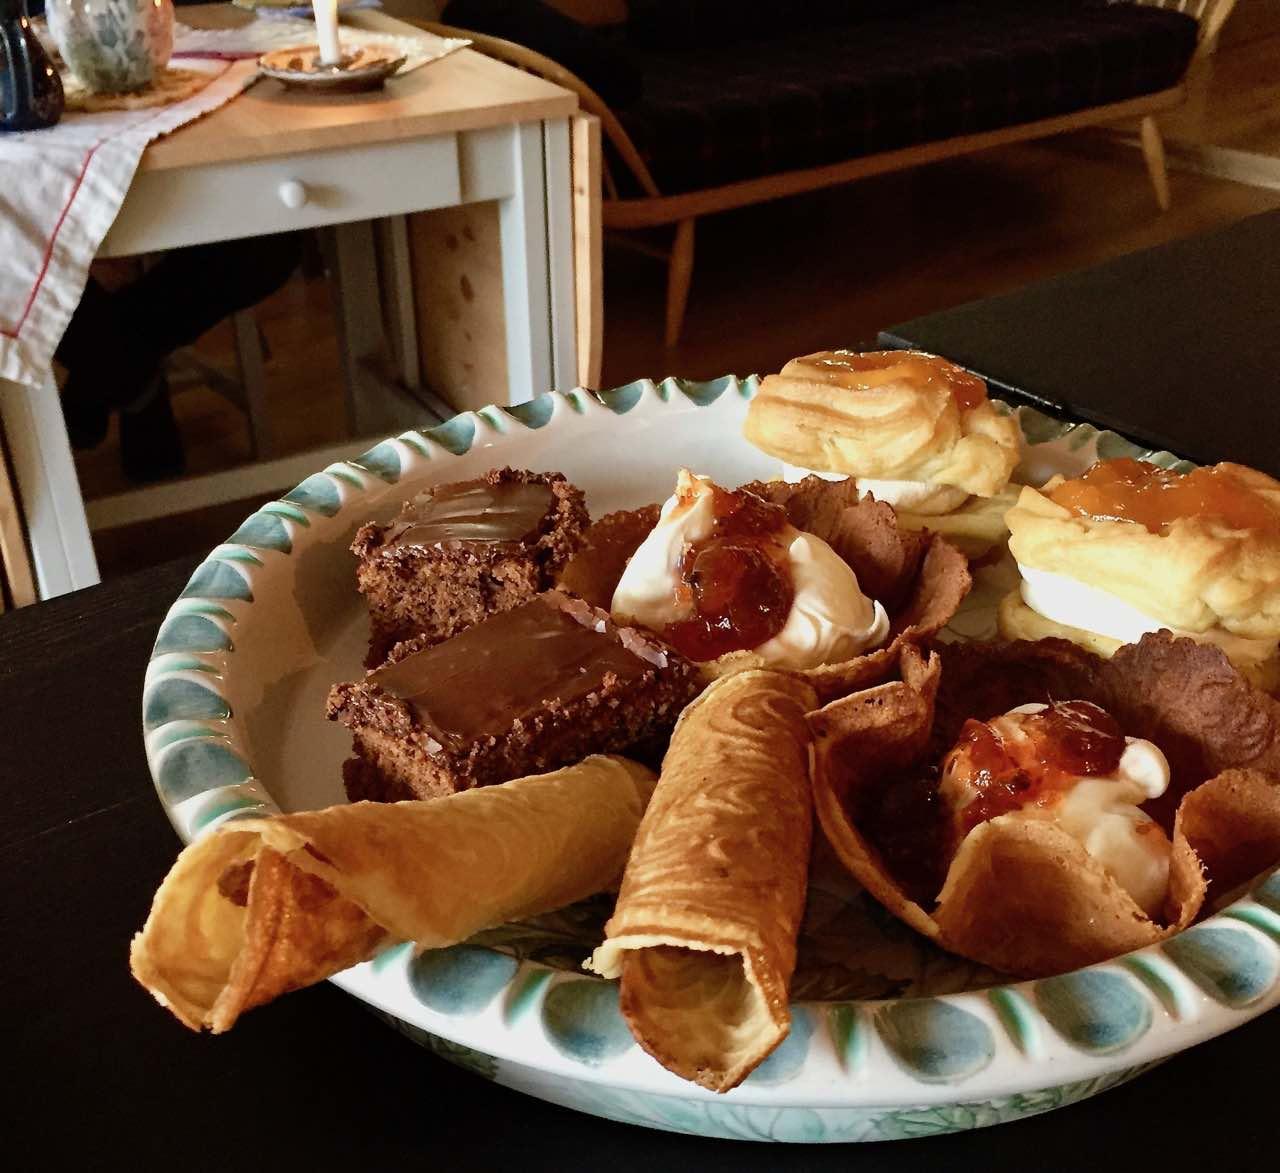 Awfully Nice Waffles!